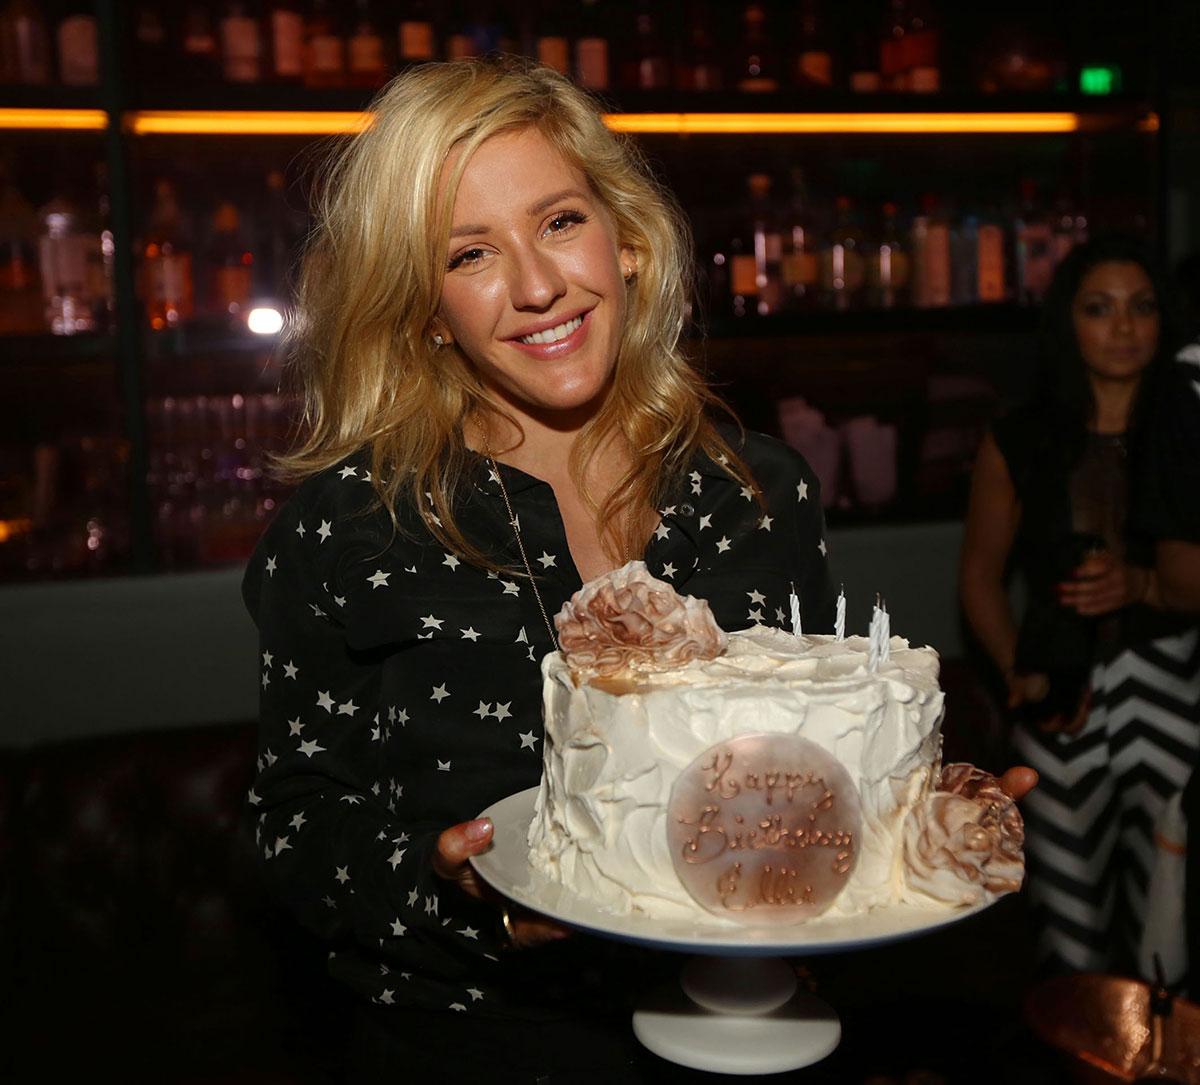 Astonishing Ellie Goulding Celebrates Her Birthday At Basement Bowl In Miami Funny Birthday Cards Online Alyptdamsfinfo